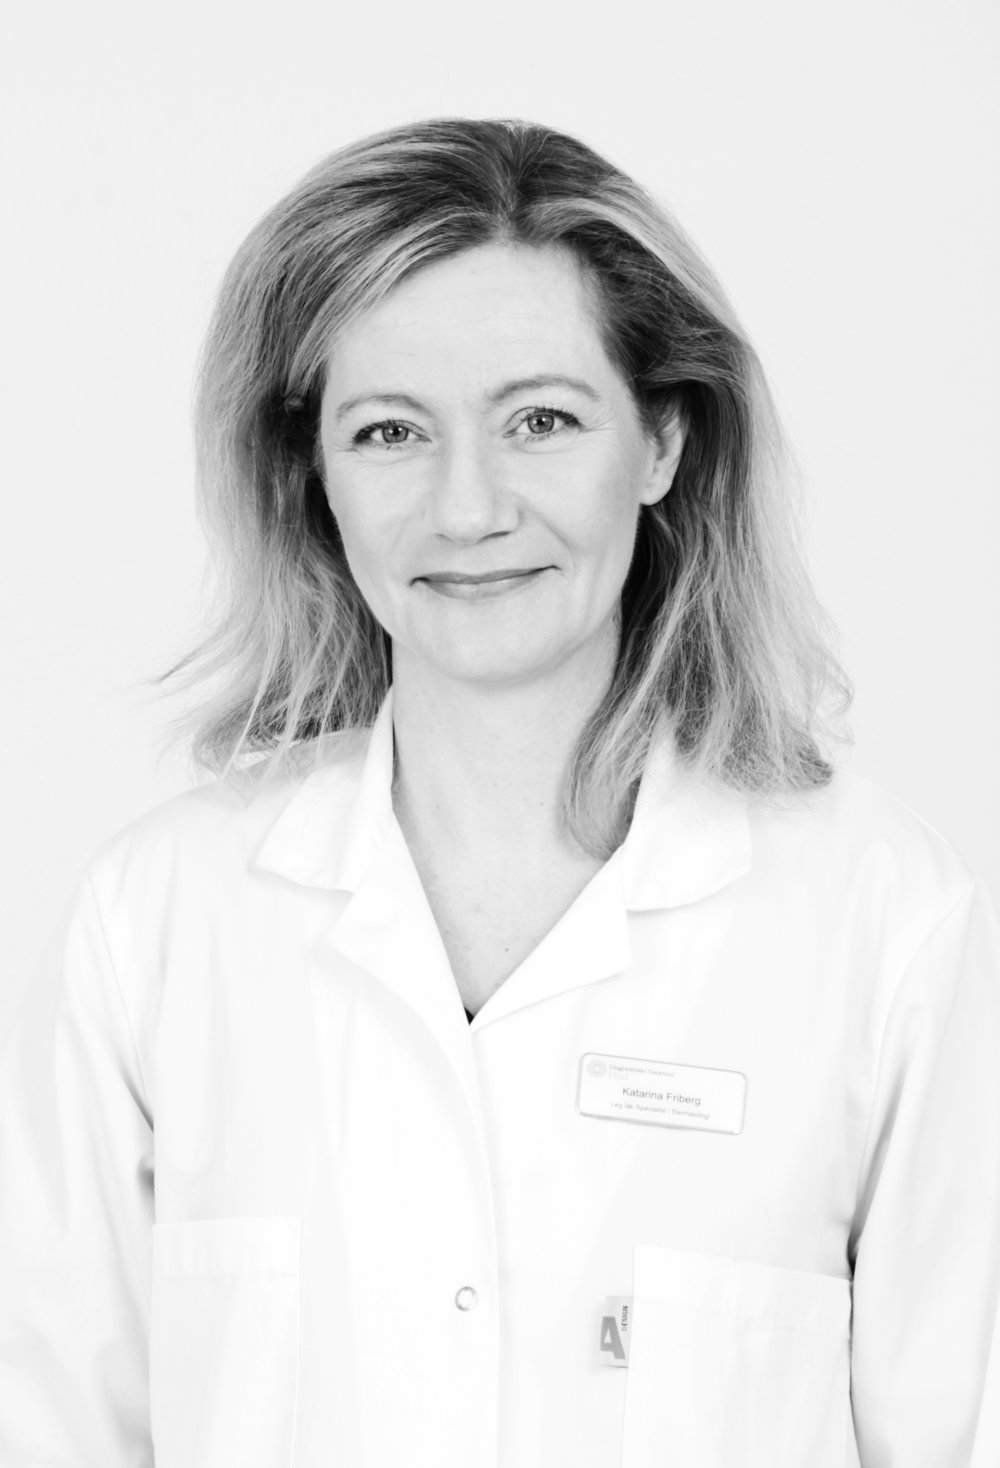 Katarina Friberg